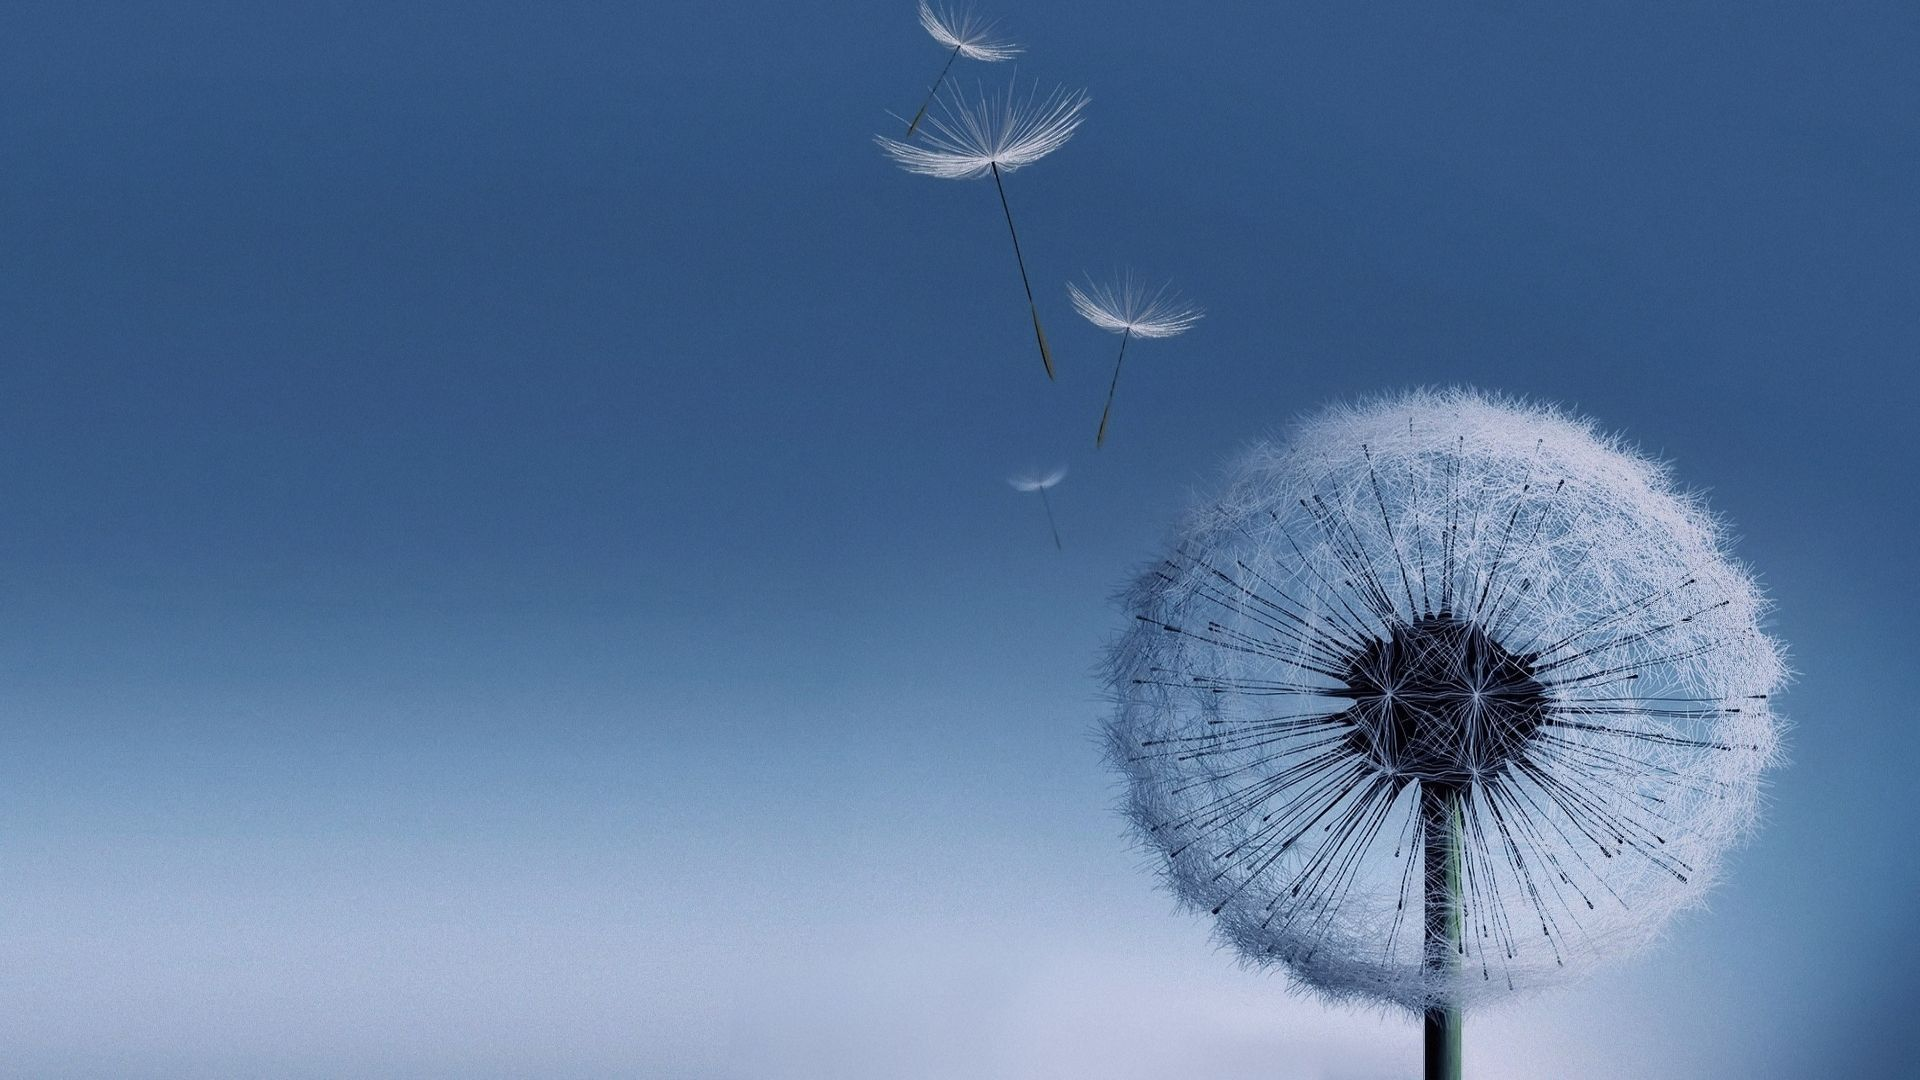 Dandelion wallpaper photo